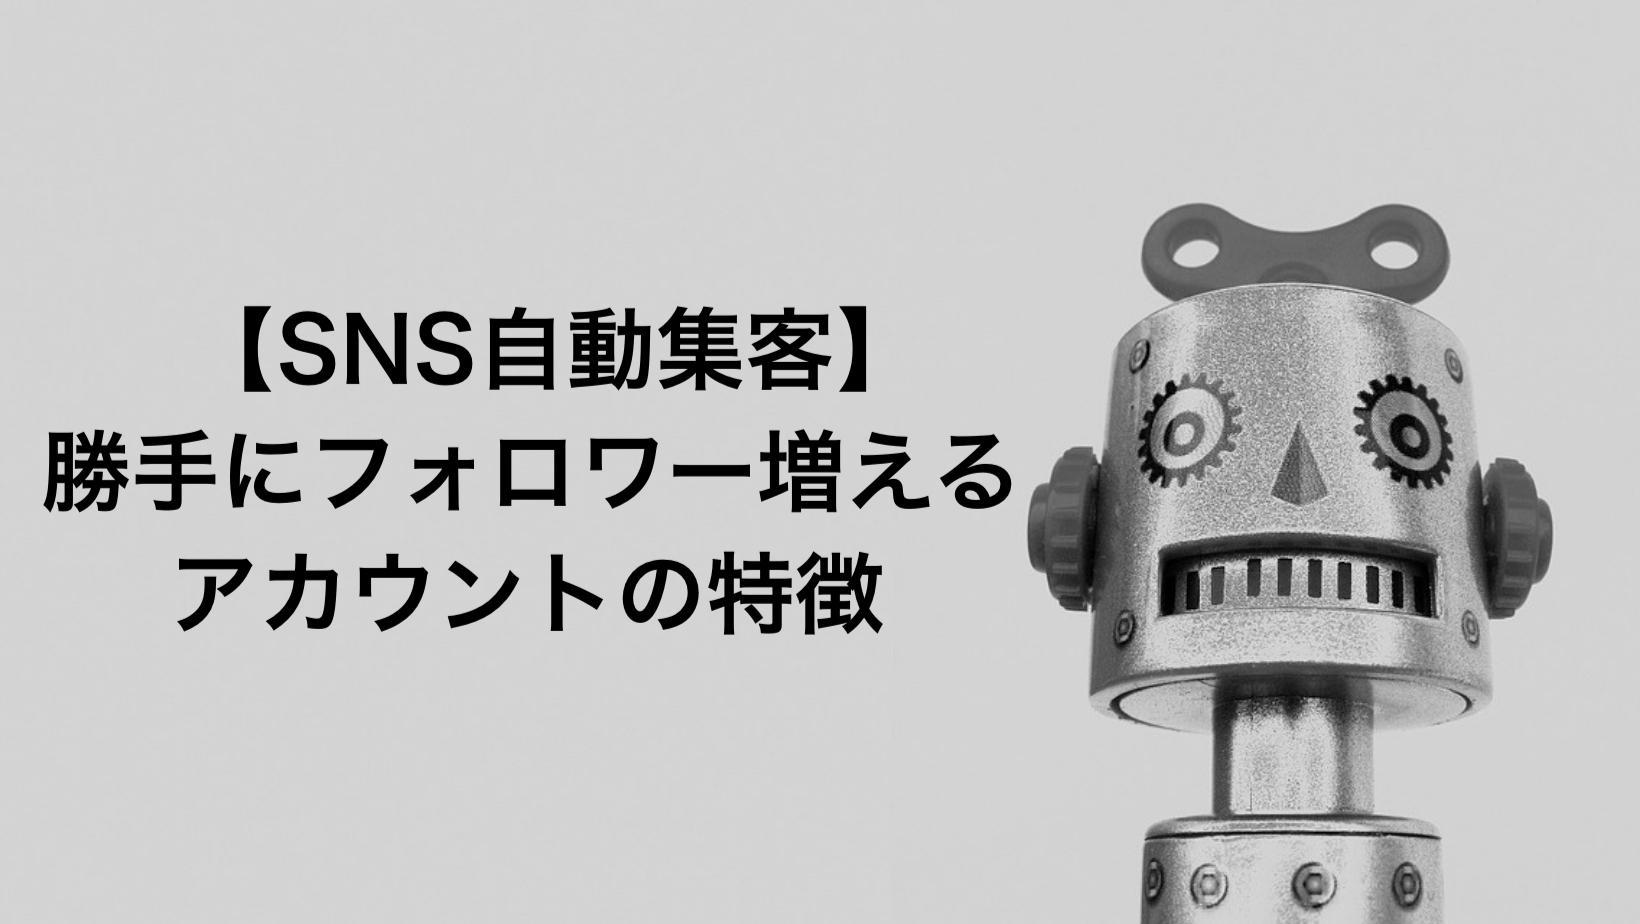 『SNS自動集客』勝手にフォロワーが増えるアカウントの特徴!!